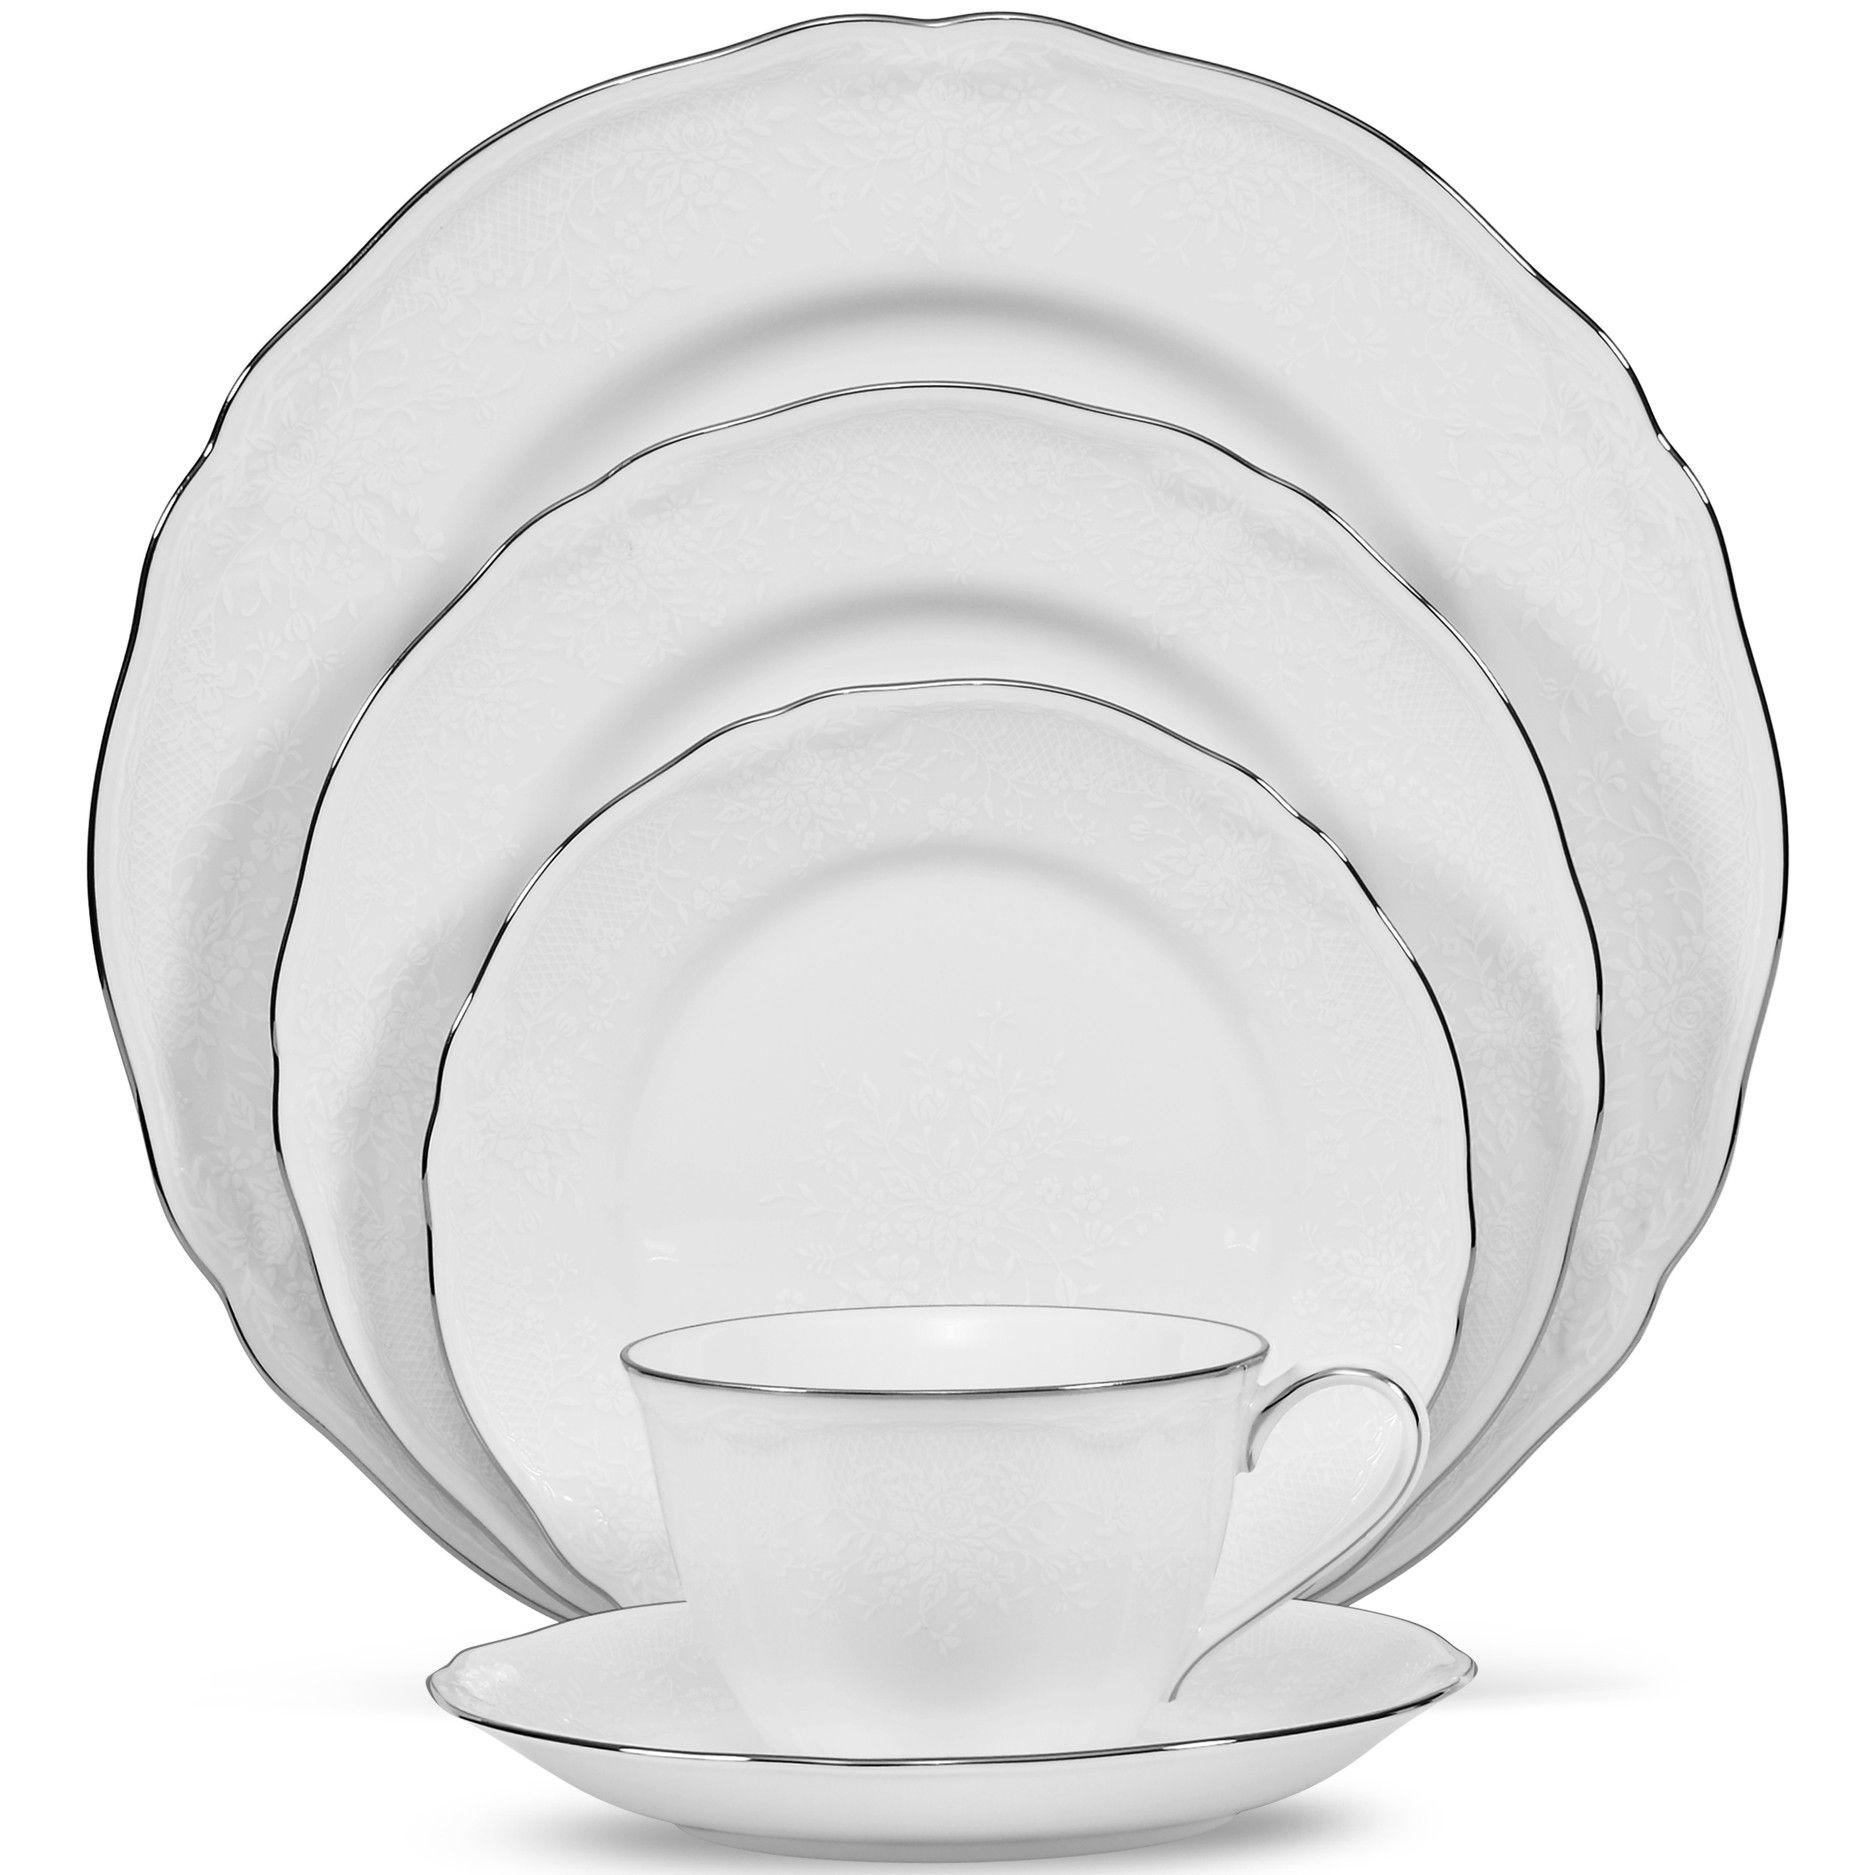 Ceramic Dinner Sets In Chennai Best Luxury Dinnerware Brands In Chennai Bangalore Hyderabad In 2020 Luxury Dinnerware Noritake Dinnerware Sets